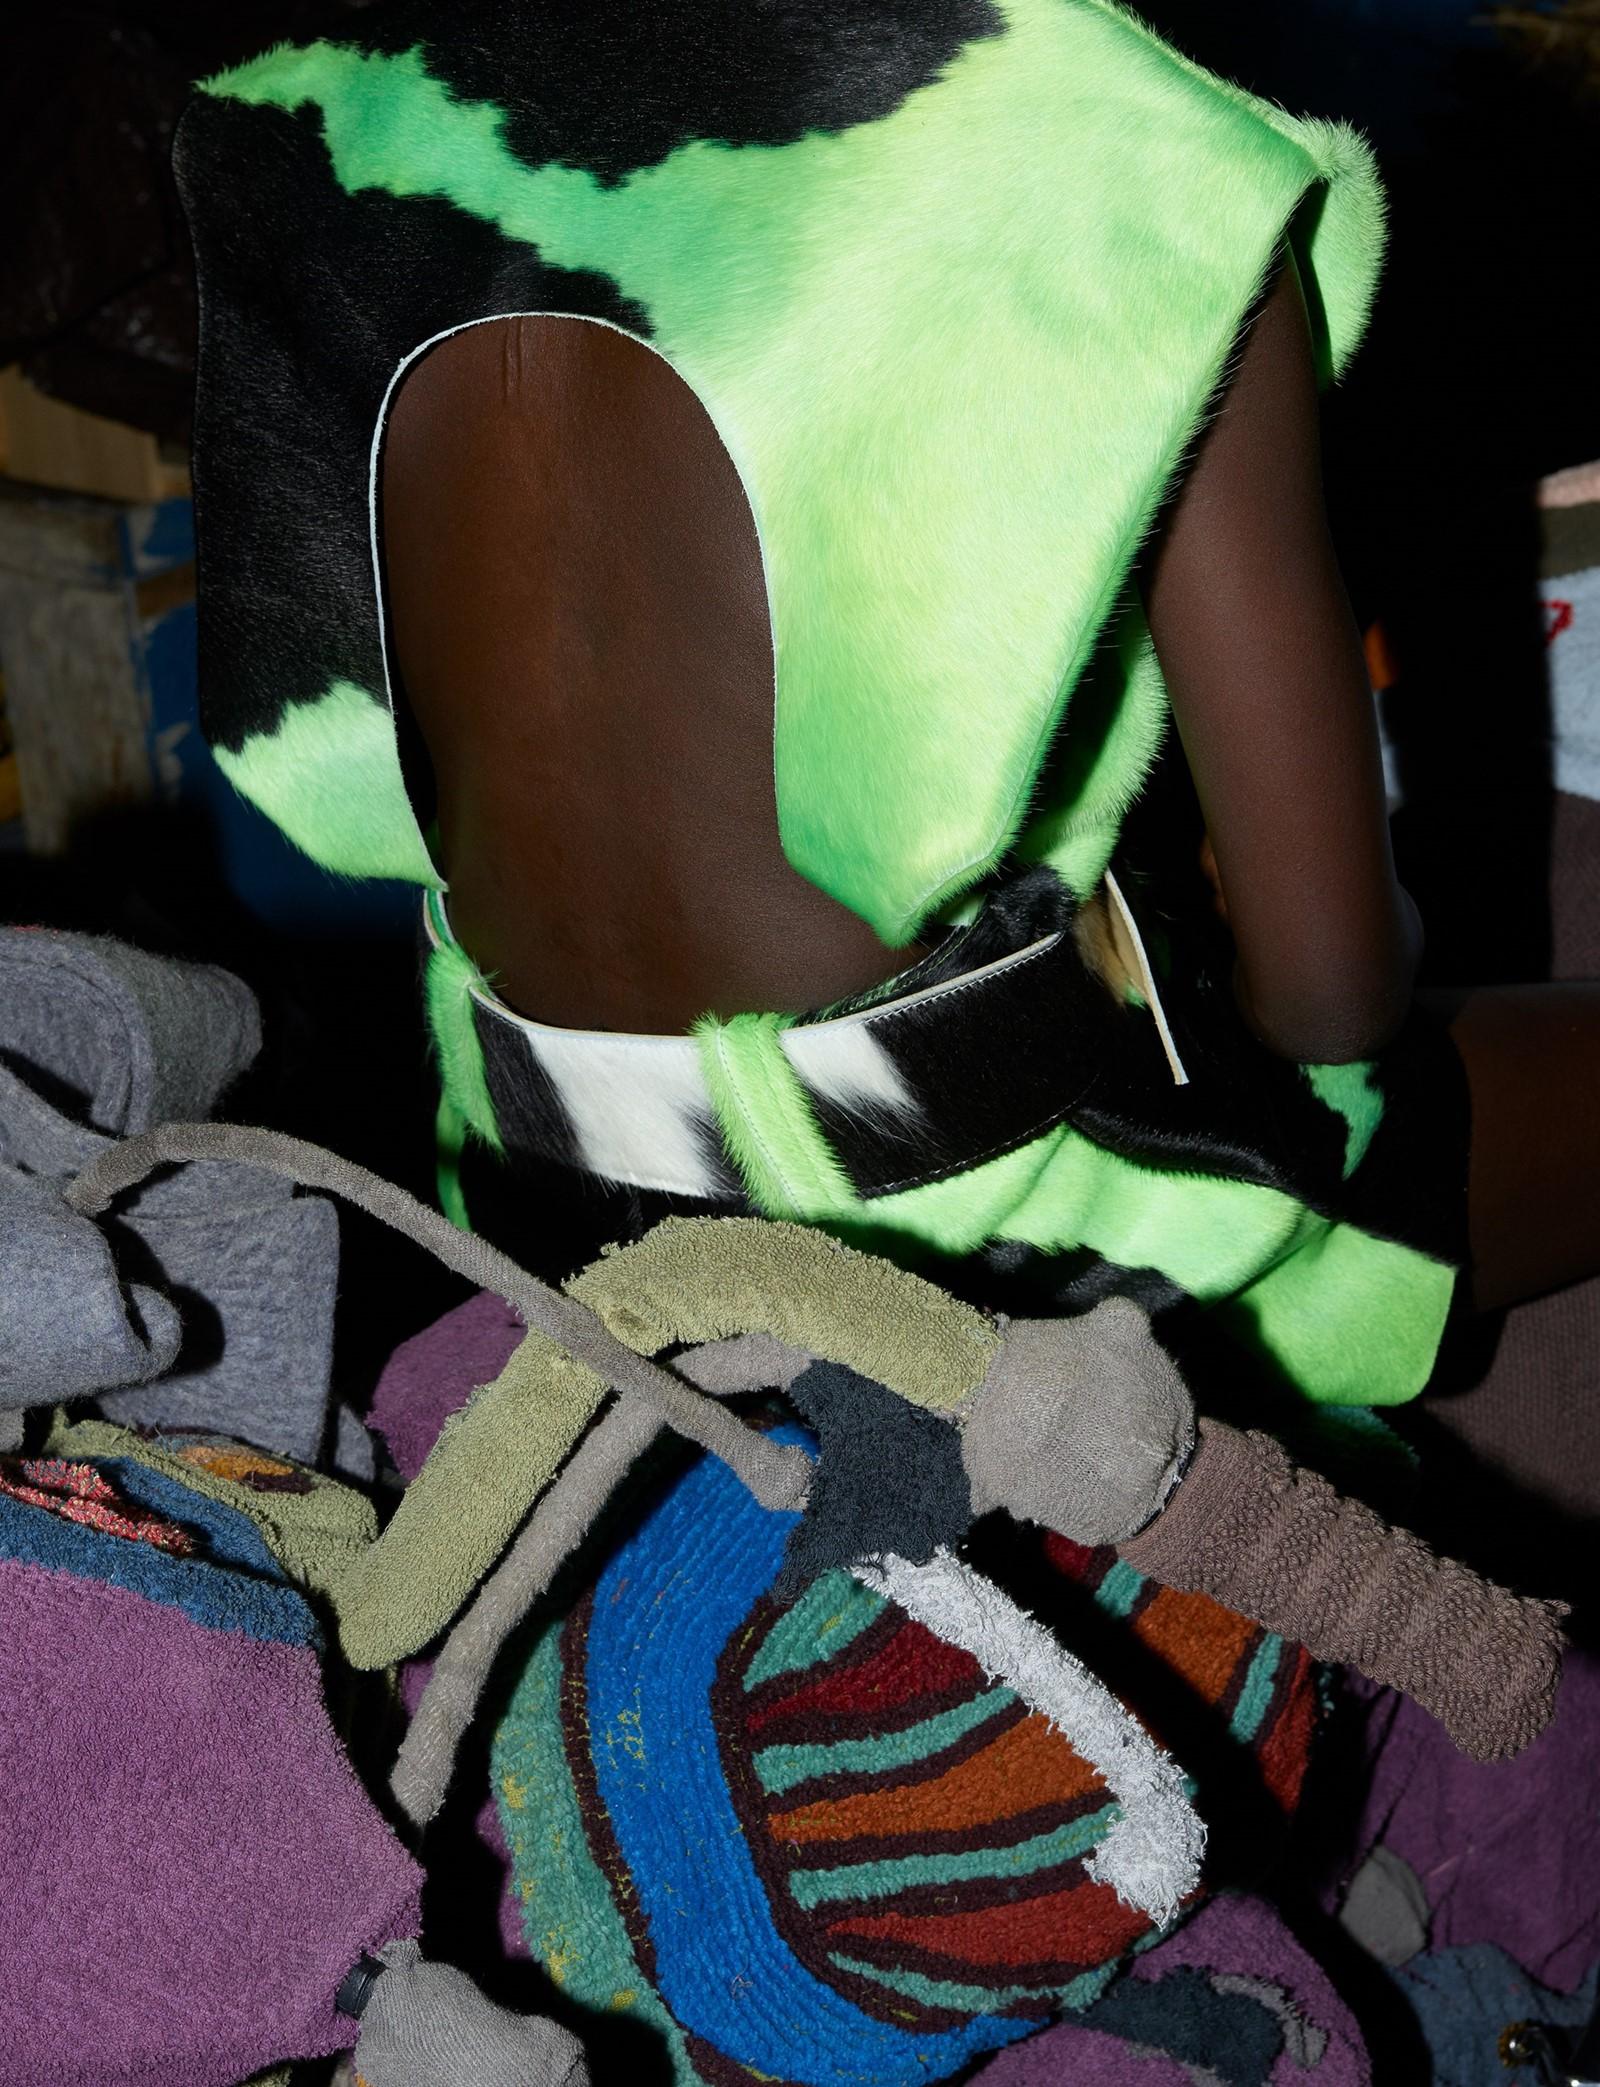 Acid cowhide dress with belt, Mowalola. Adut Akech by Vivianne Sassen for Dazed Autumn 2019.